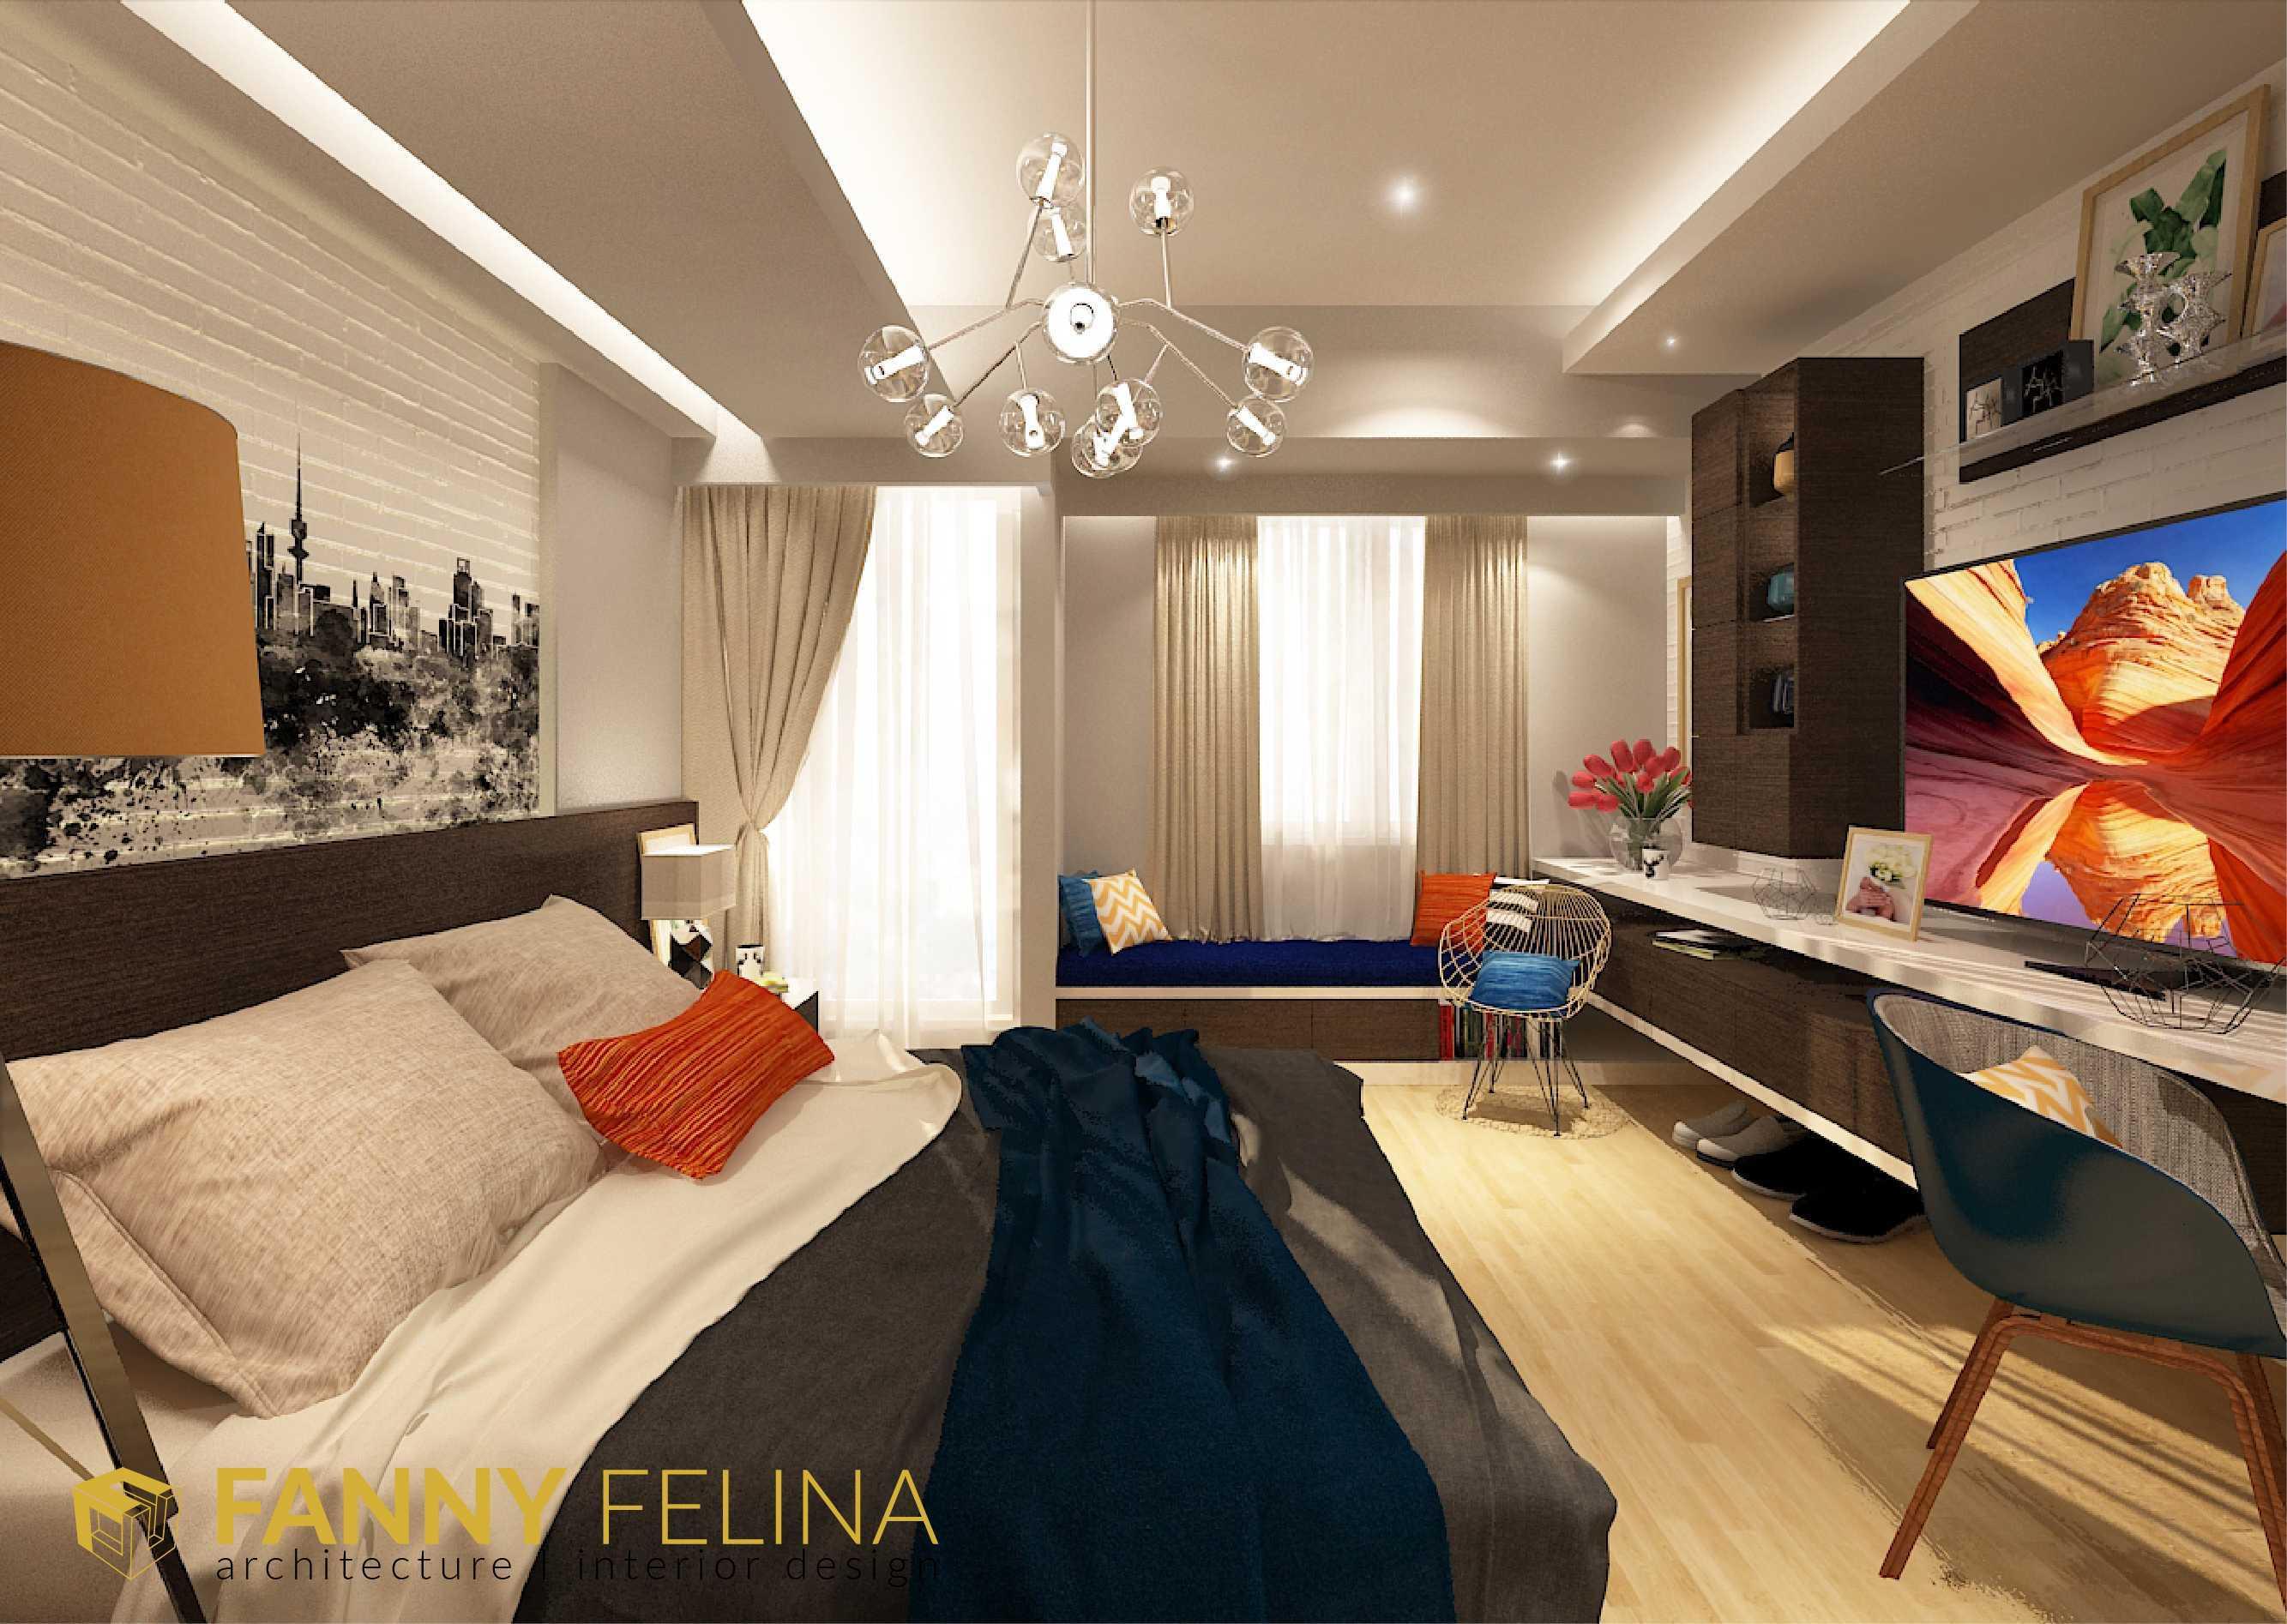 Fanny Felina Architecture & Interior Design Tanglin Studio Apartment 02 Kota Sby, Jawa Timur, Indonesia Kota Sby, Jawa Timur, Indonesia 01-1   40968